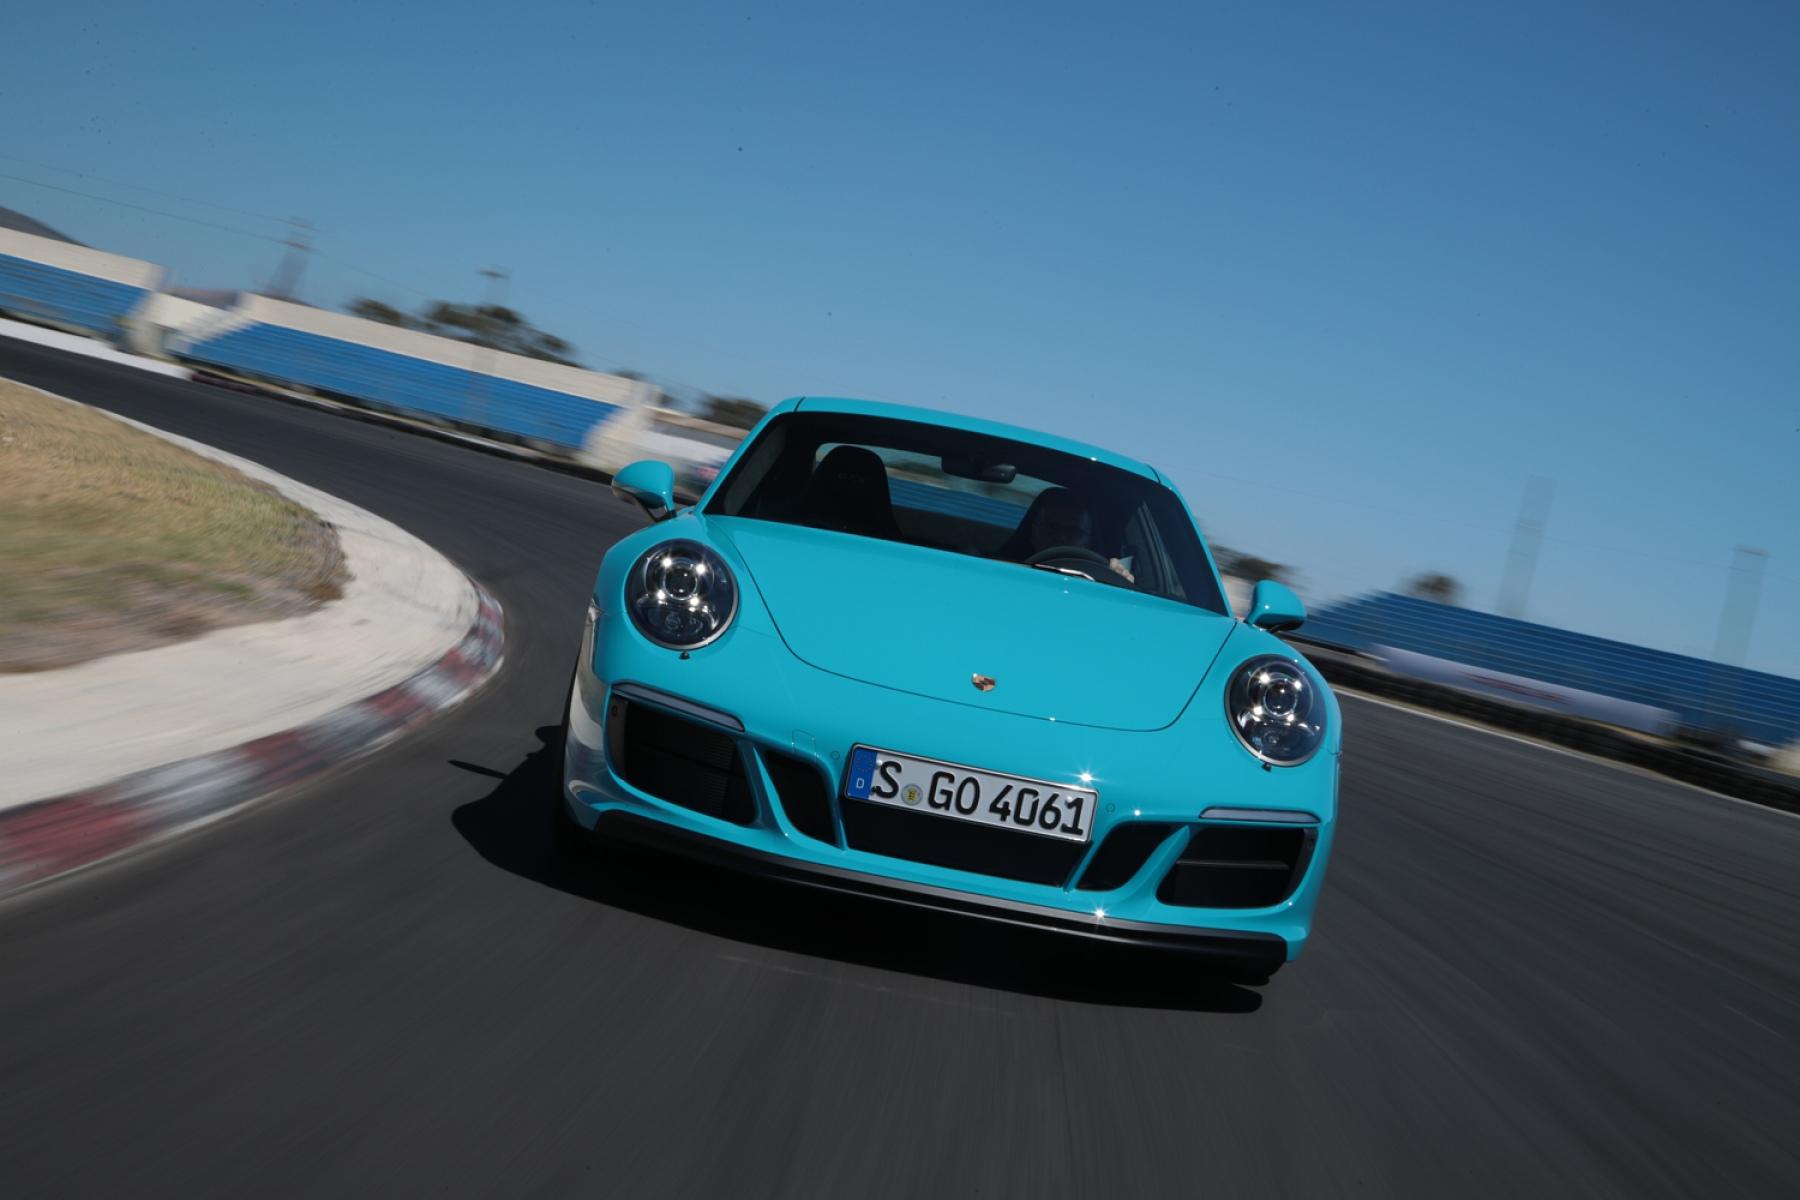 Porsche 911 Carrera Gts Coupé Miami Blue The New 911 Gts